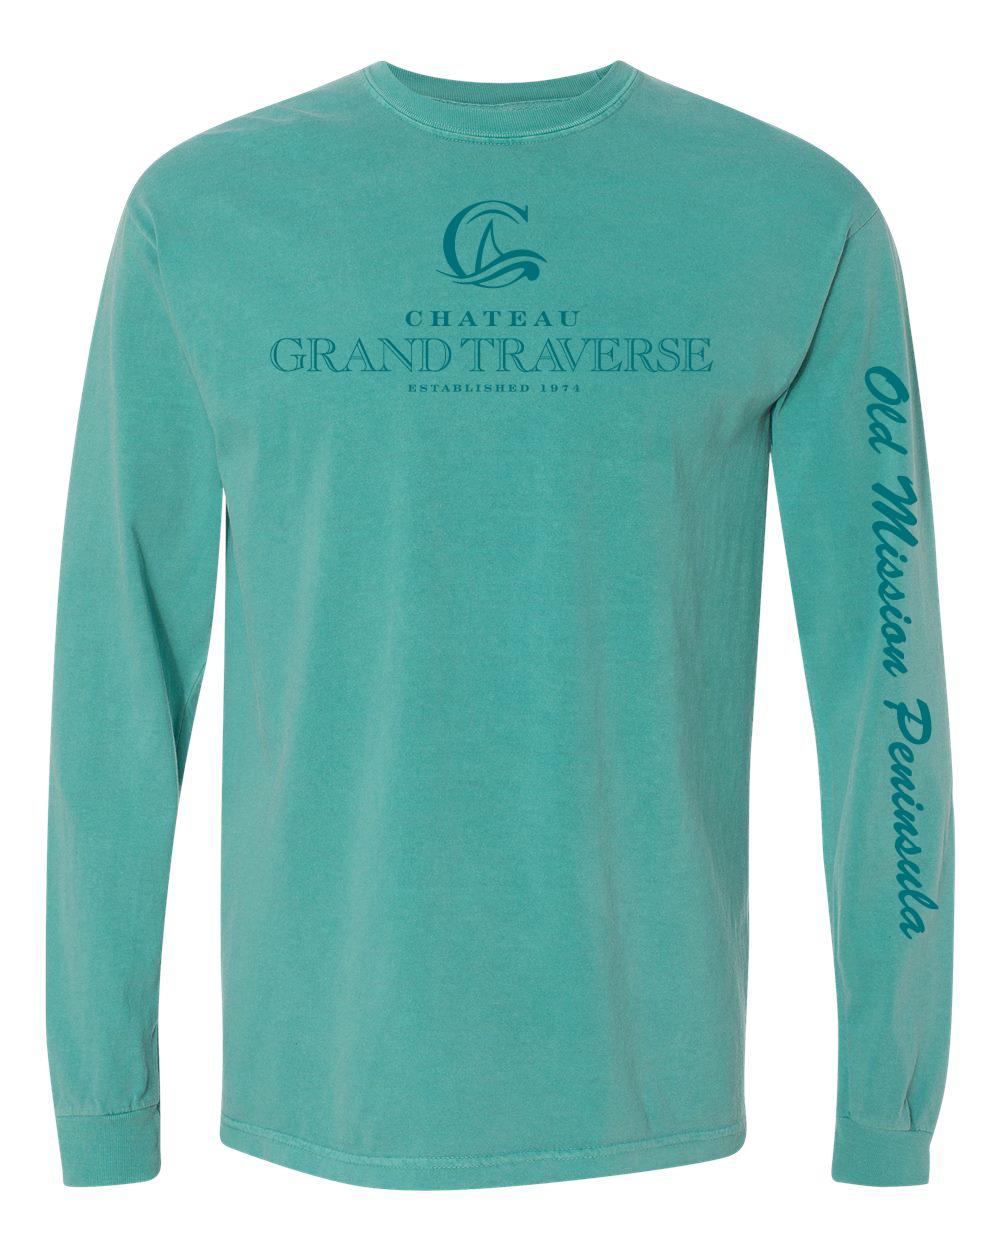 CGT Classic Long Sleeve Tee- Seafoam